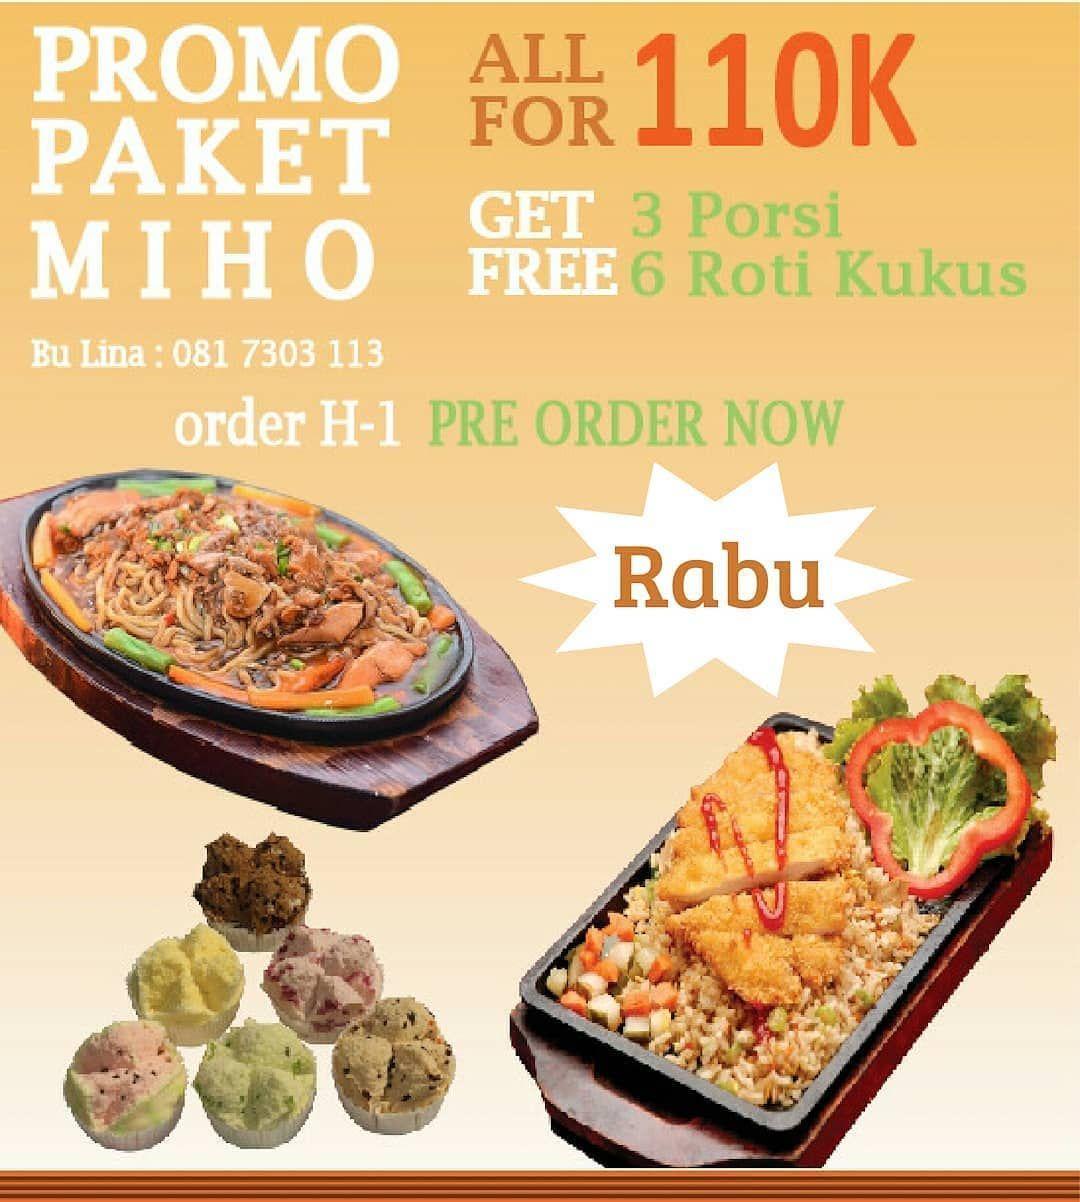 Paket Miho Rabu 110k Get All Close Order H 1 Jam 20 00 Promo Paket Mie Hotplate Spicy Chicken Chicken Katsu Fried Rice Mie Hotplate S Makanan Roti Mie